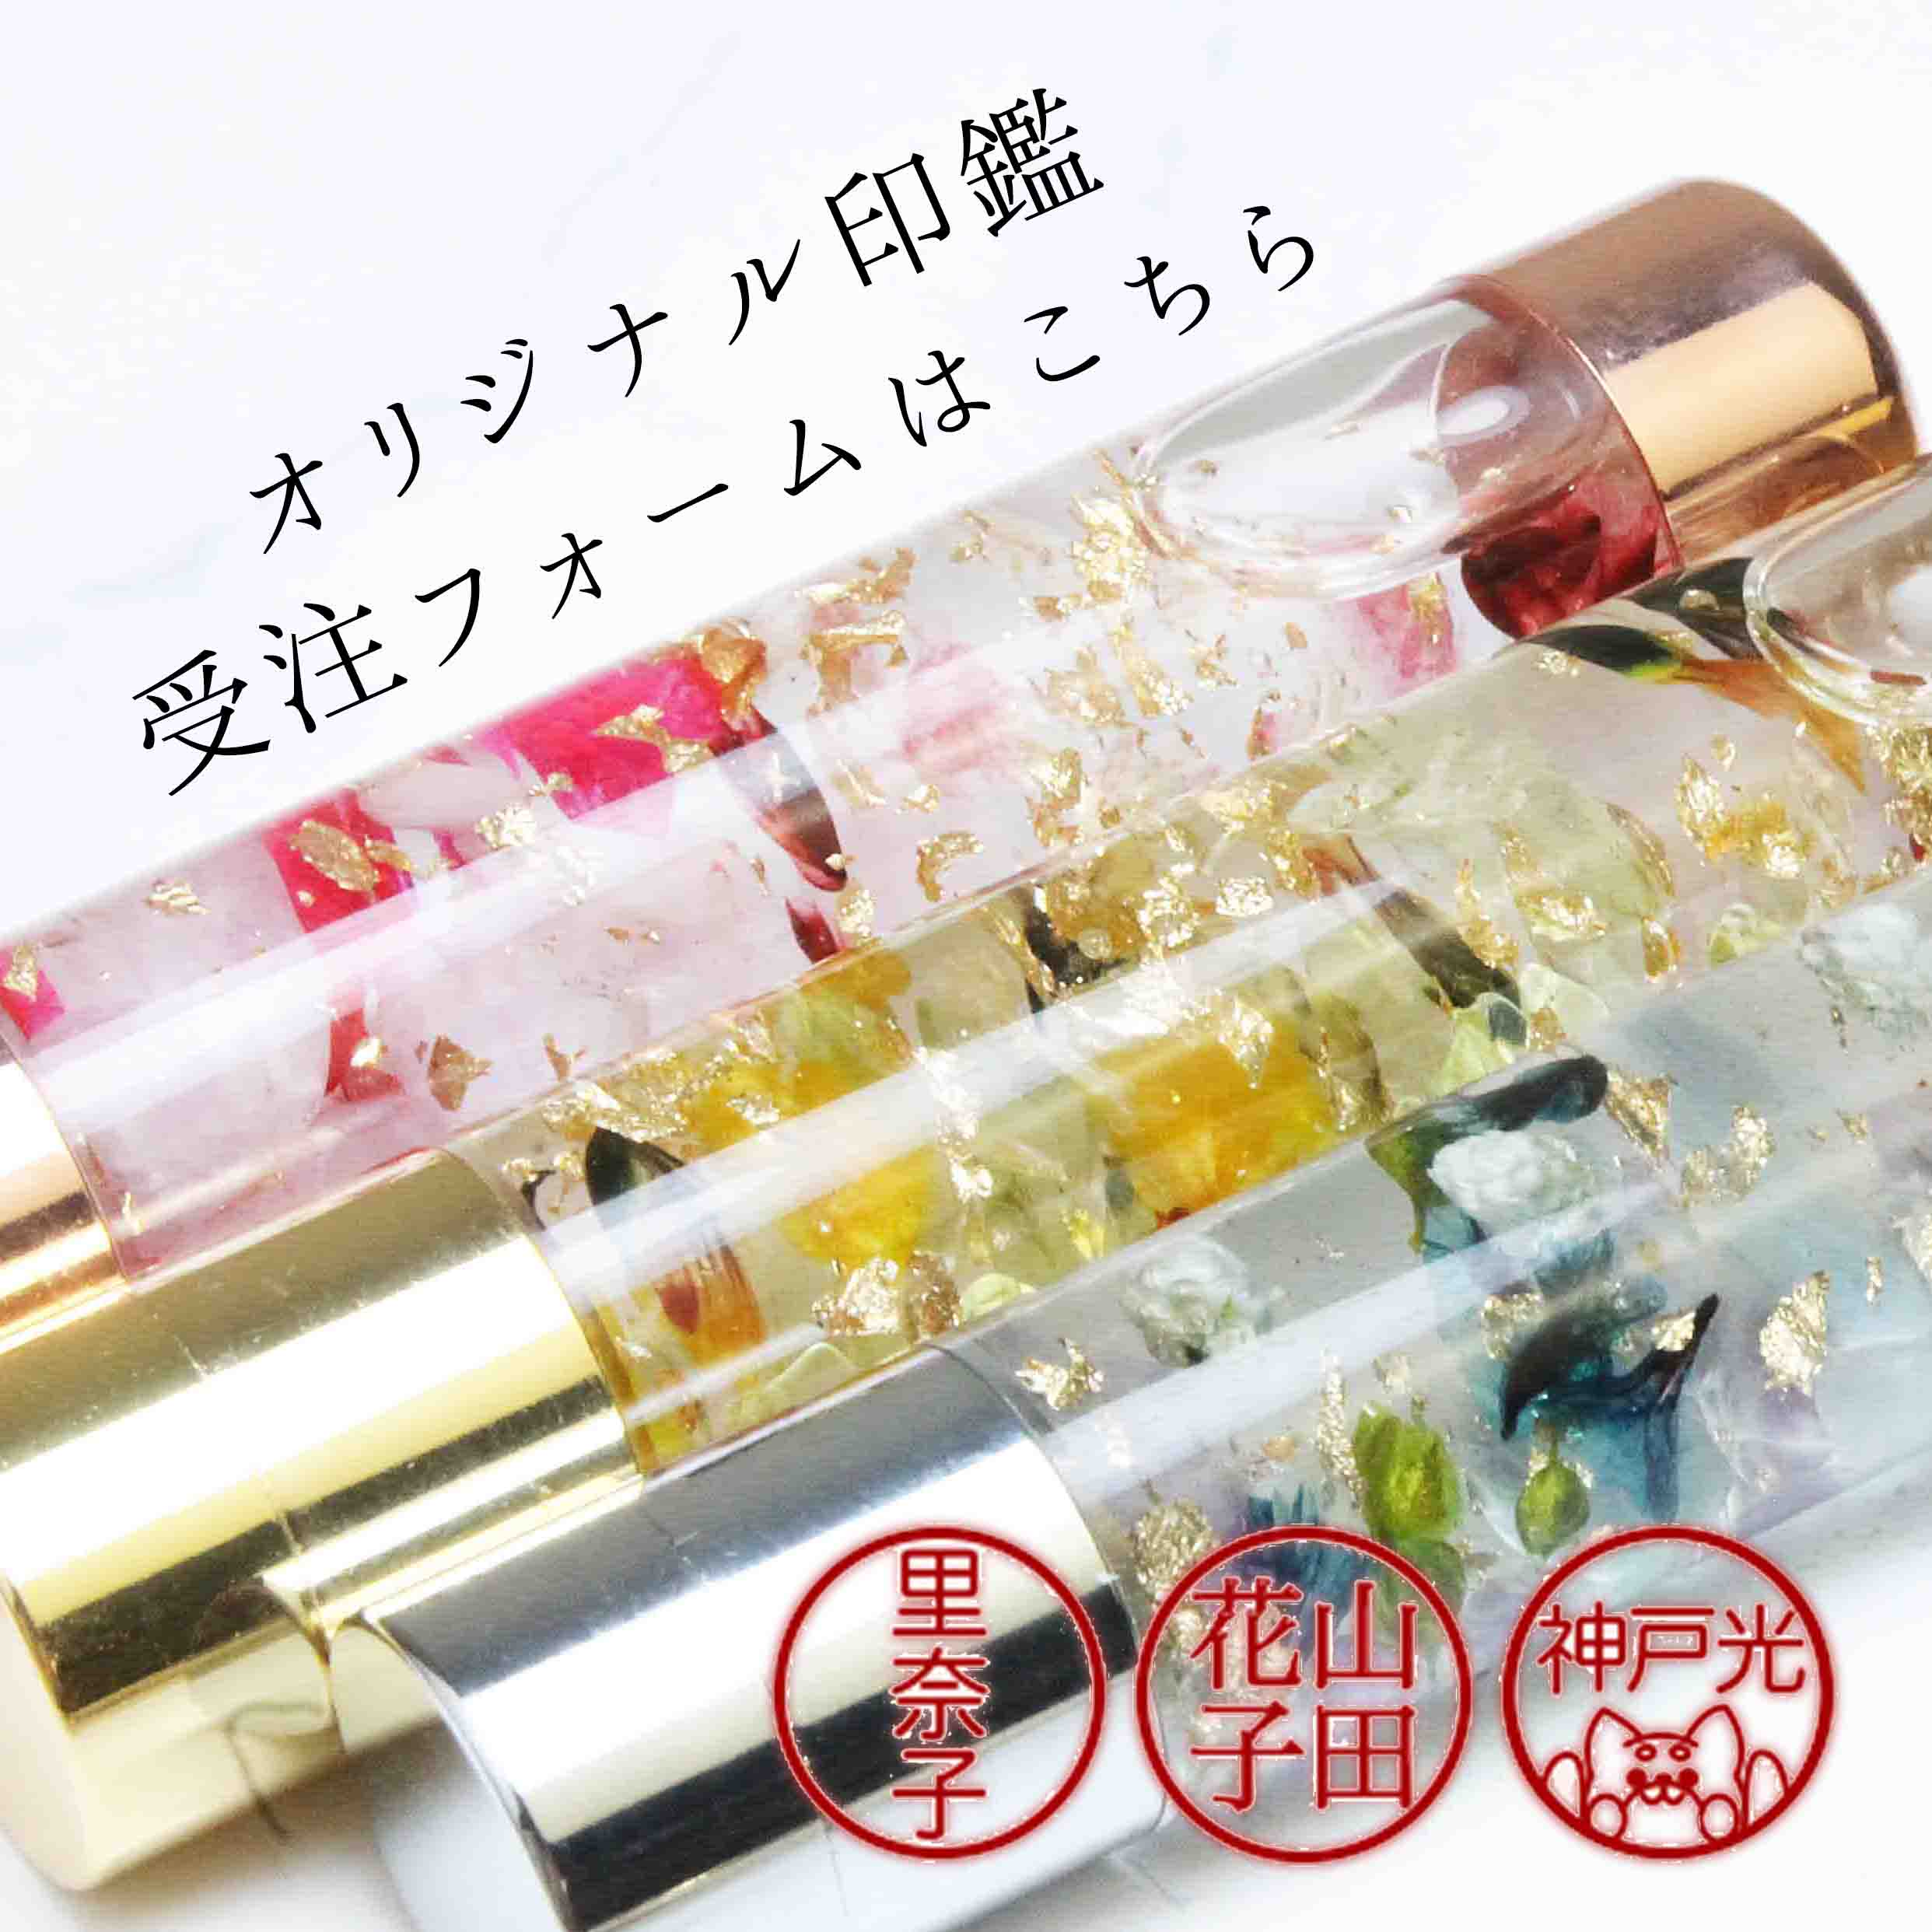 https://www.stoneclub.jp/data/stoneclub/image/7653643.jpg